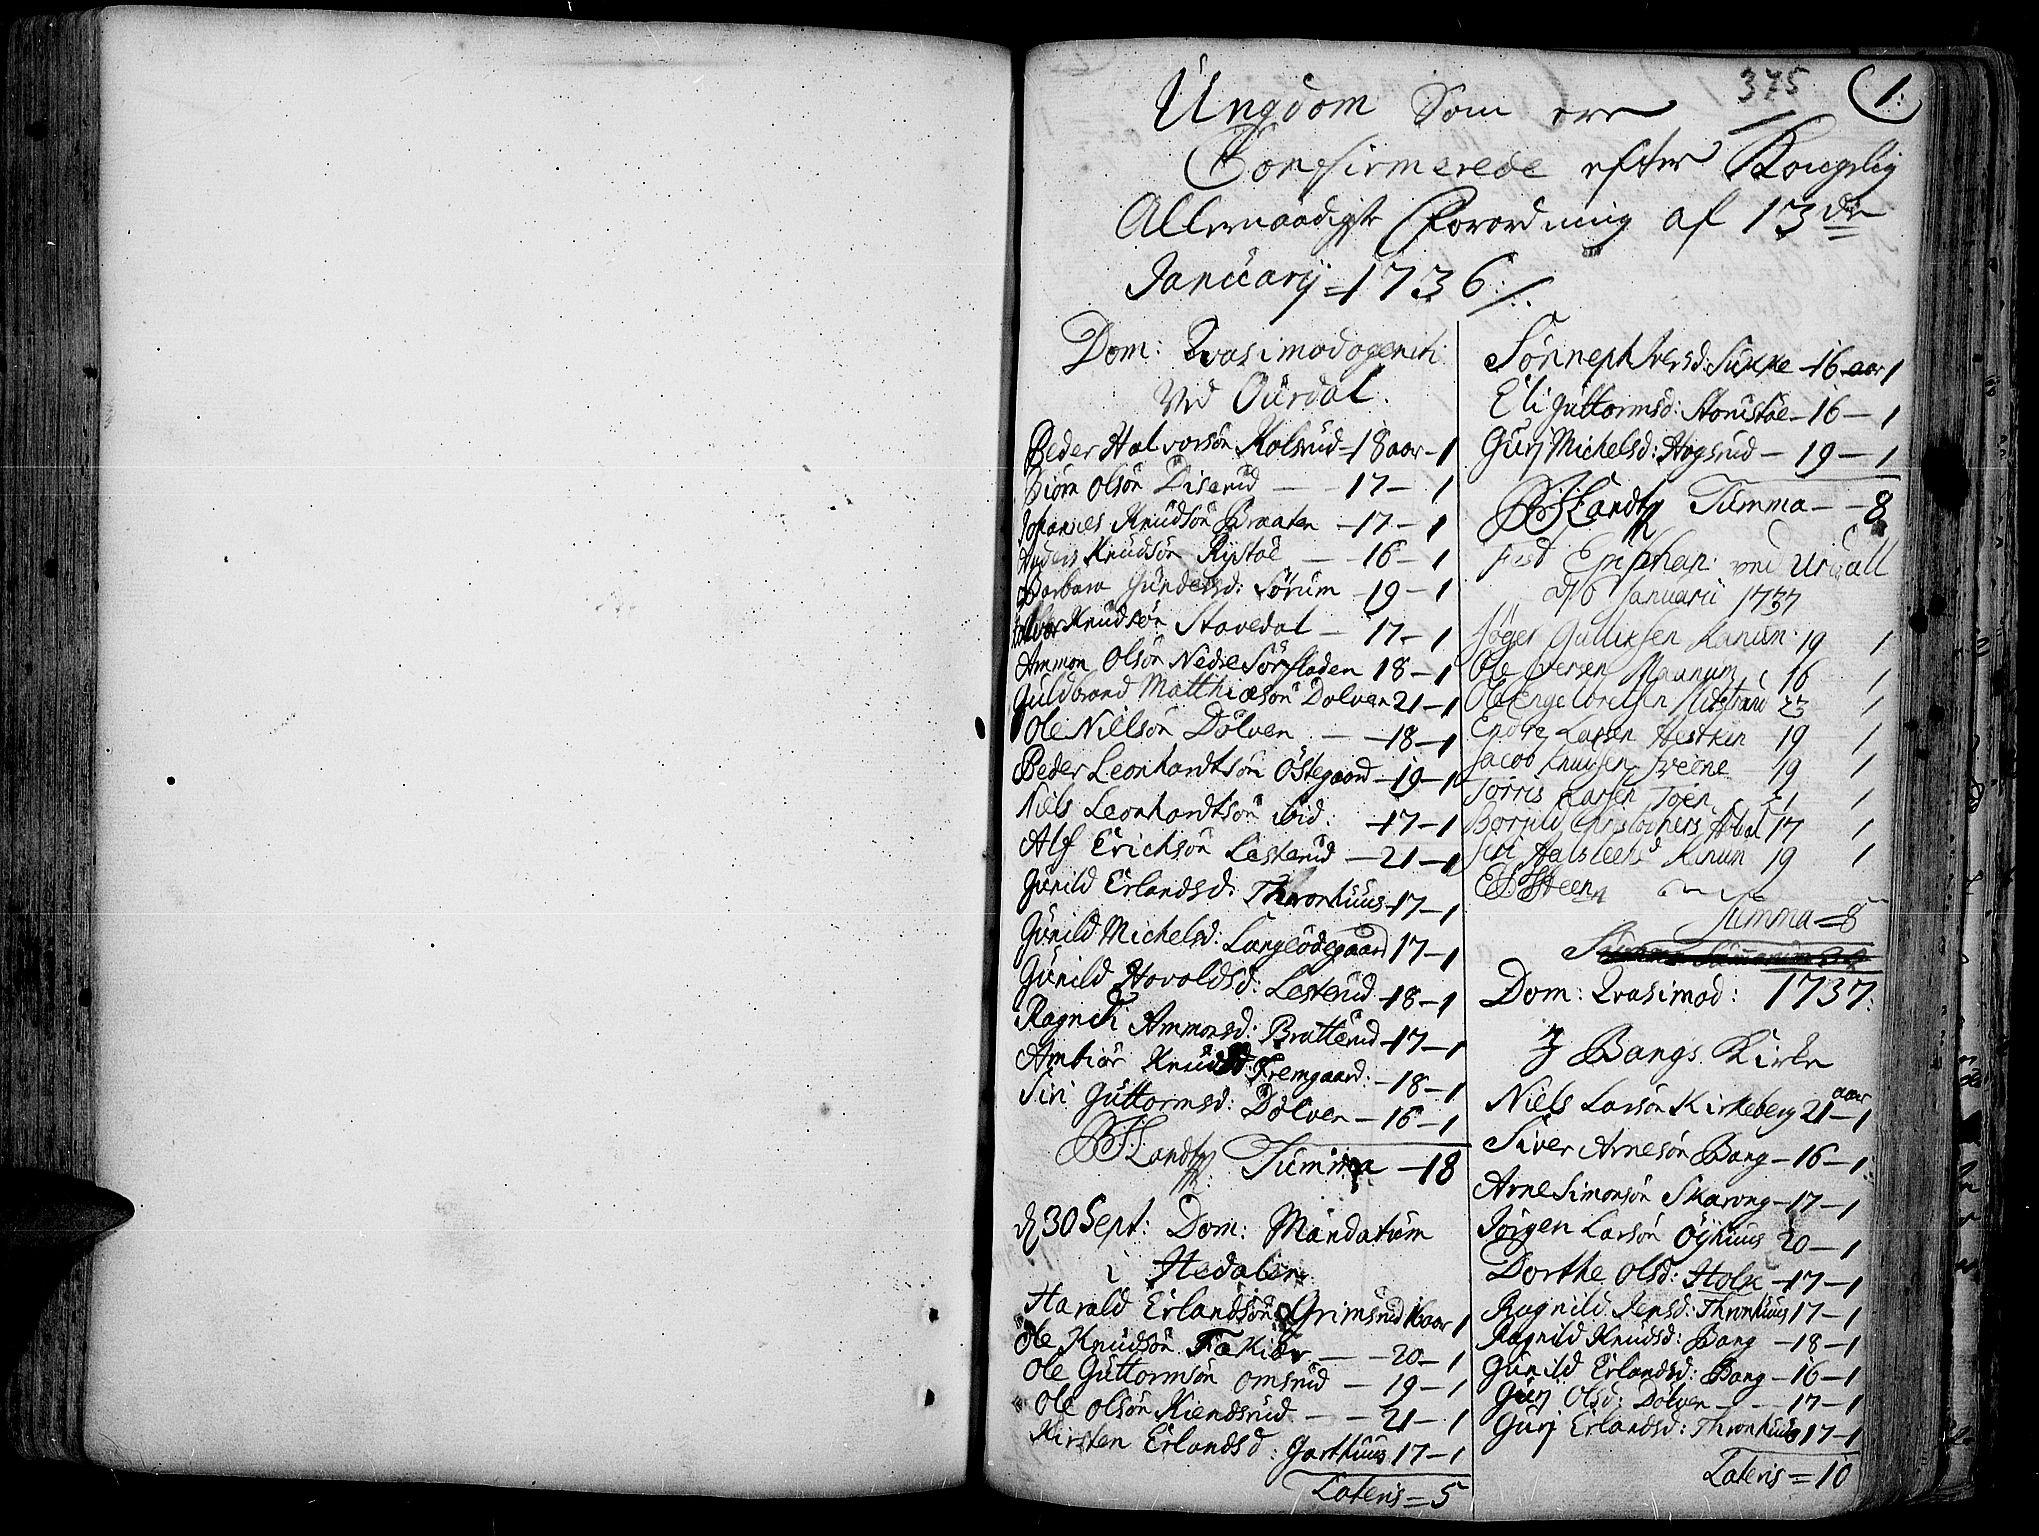 SAH, Aurdal prestekontor, Ministerialbok nr. 4, 1730-1762, s. 0-1